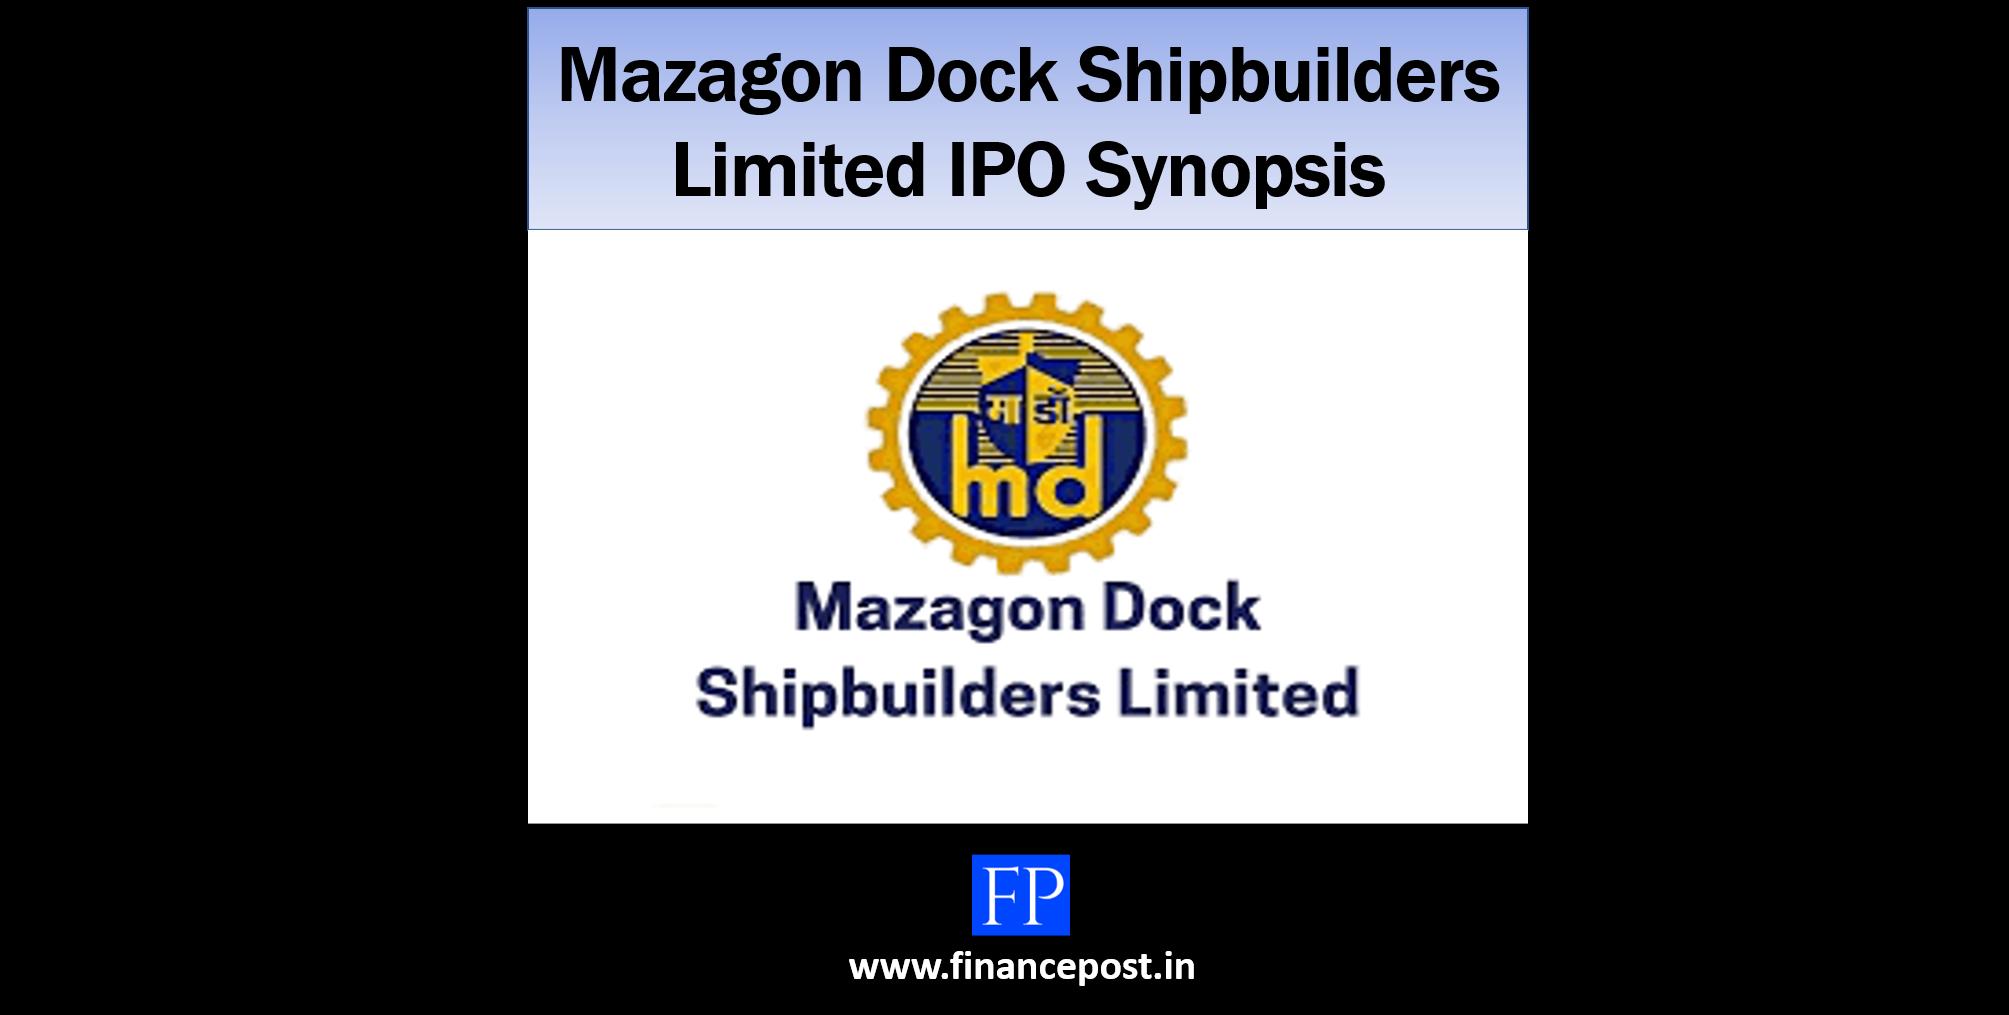 Mazagon Dock Shipbuilders Limited IPO Synopsis